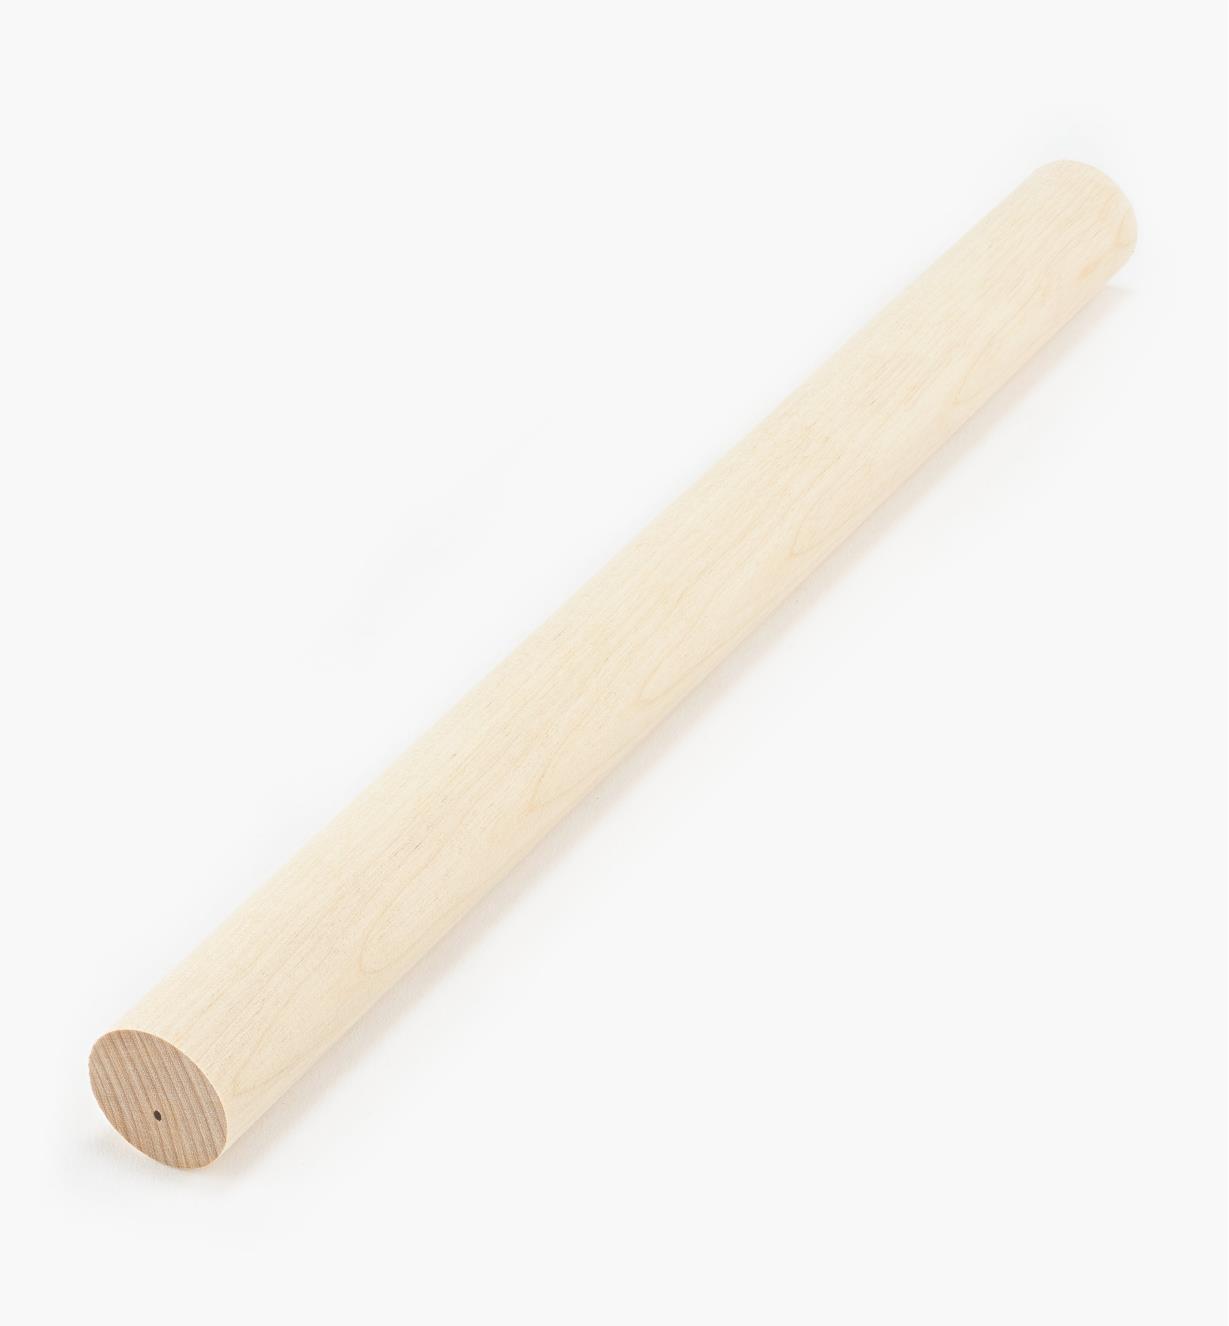 41K3007 - Goujon en bois dur de 1pox1pi